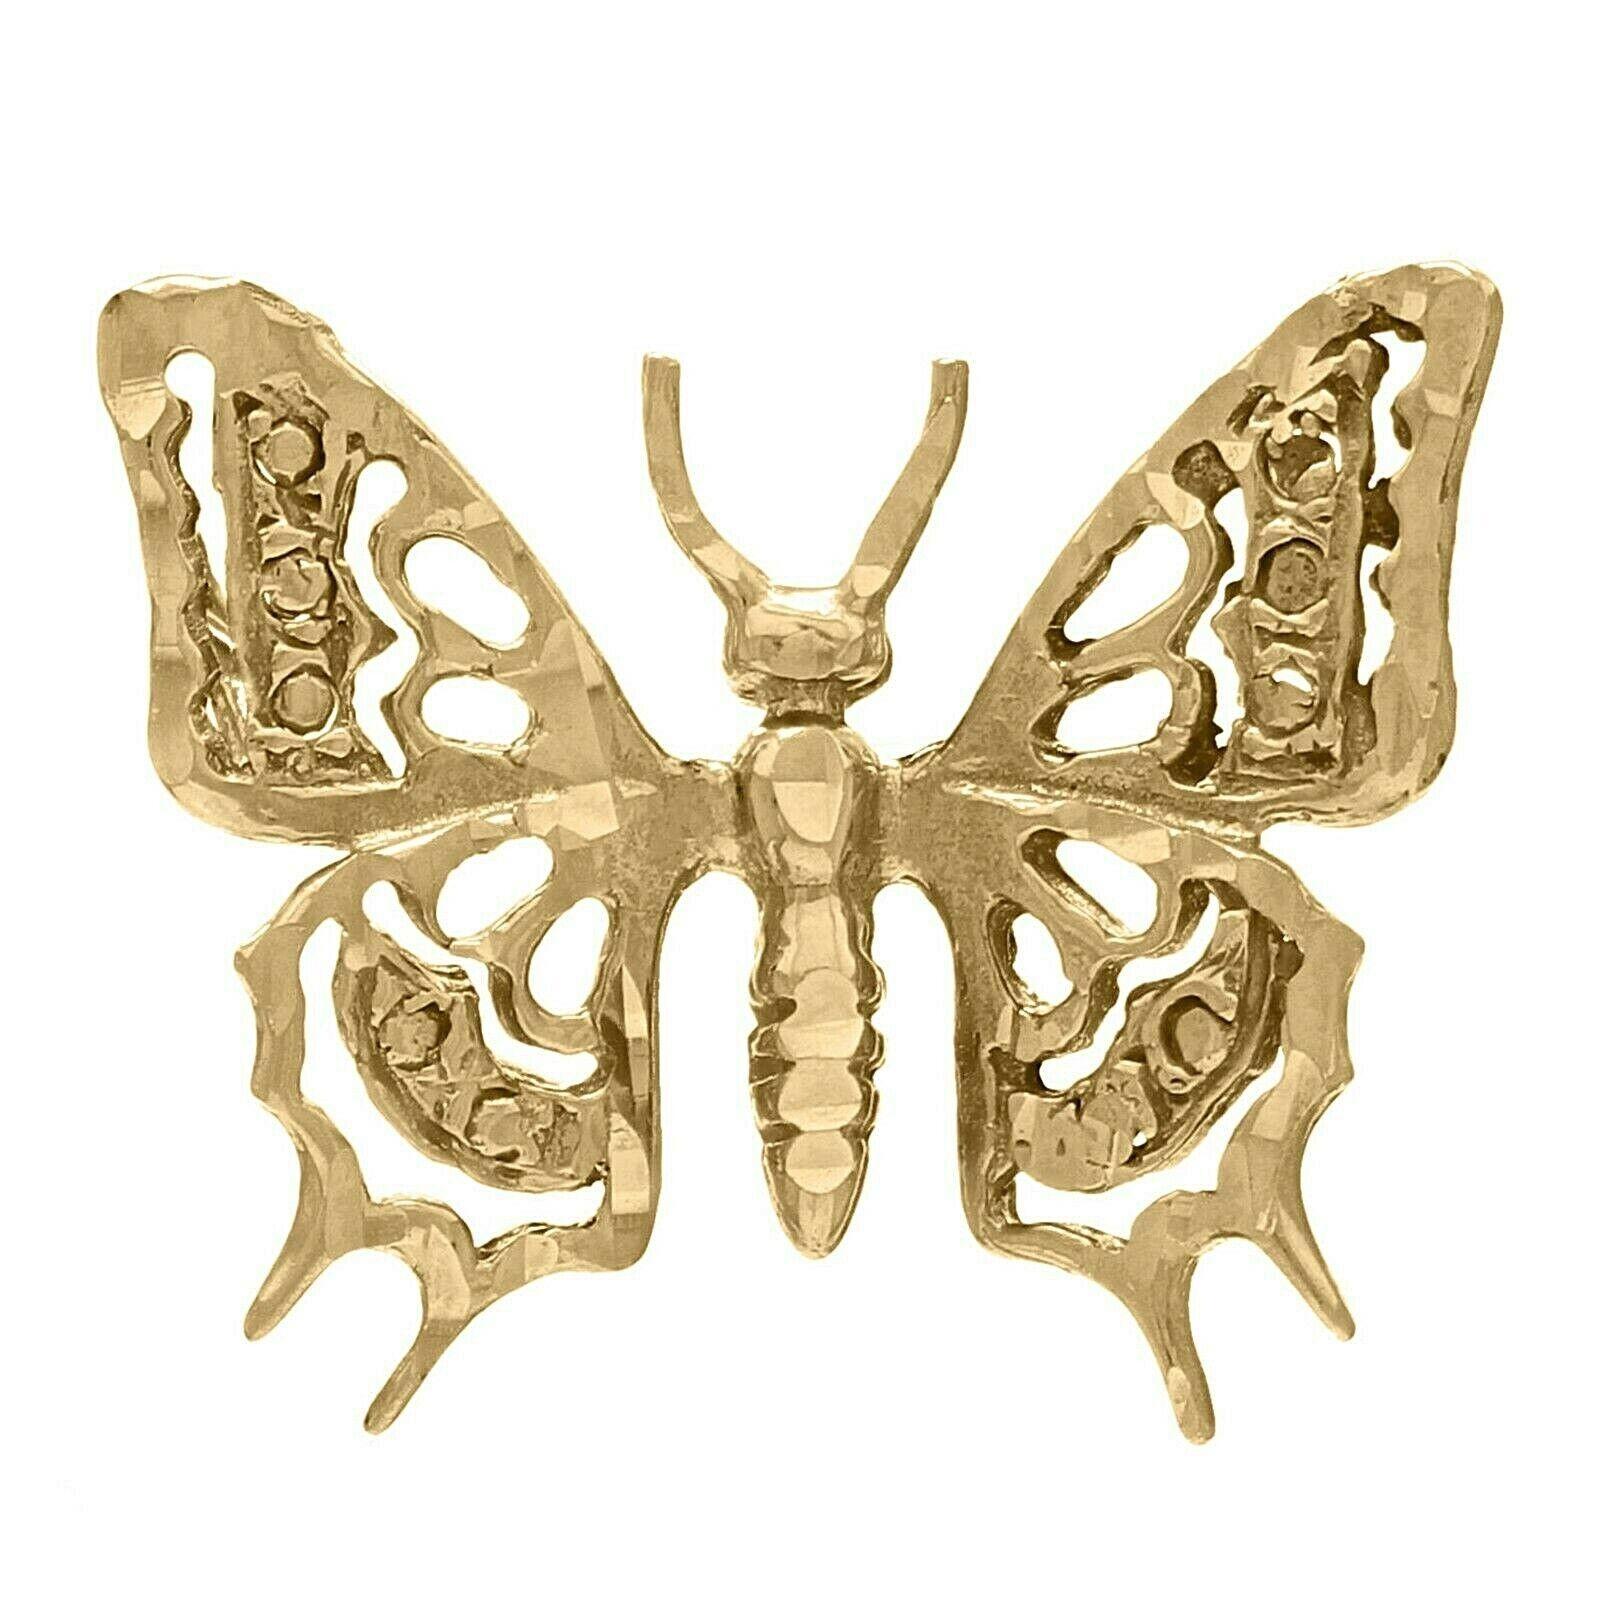 14K Yellow gold Diamond Cut Butterfly Charm Pendant 2 grams